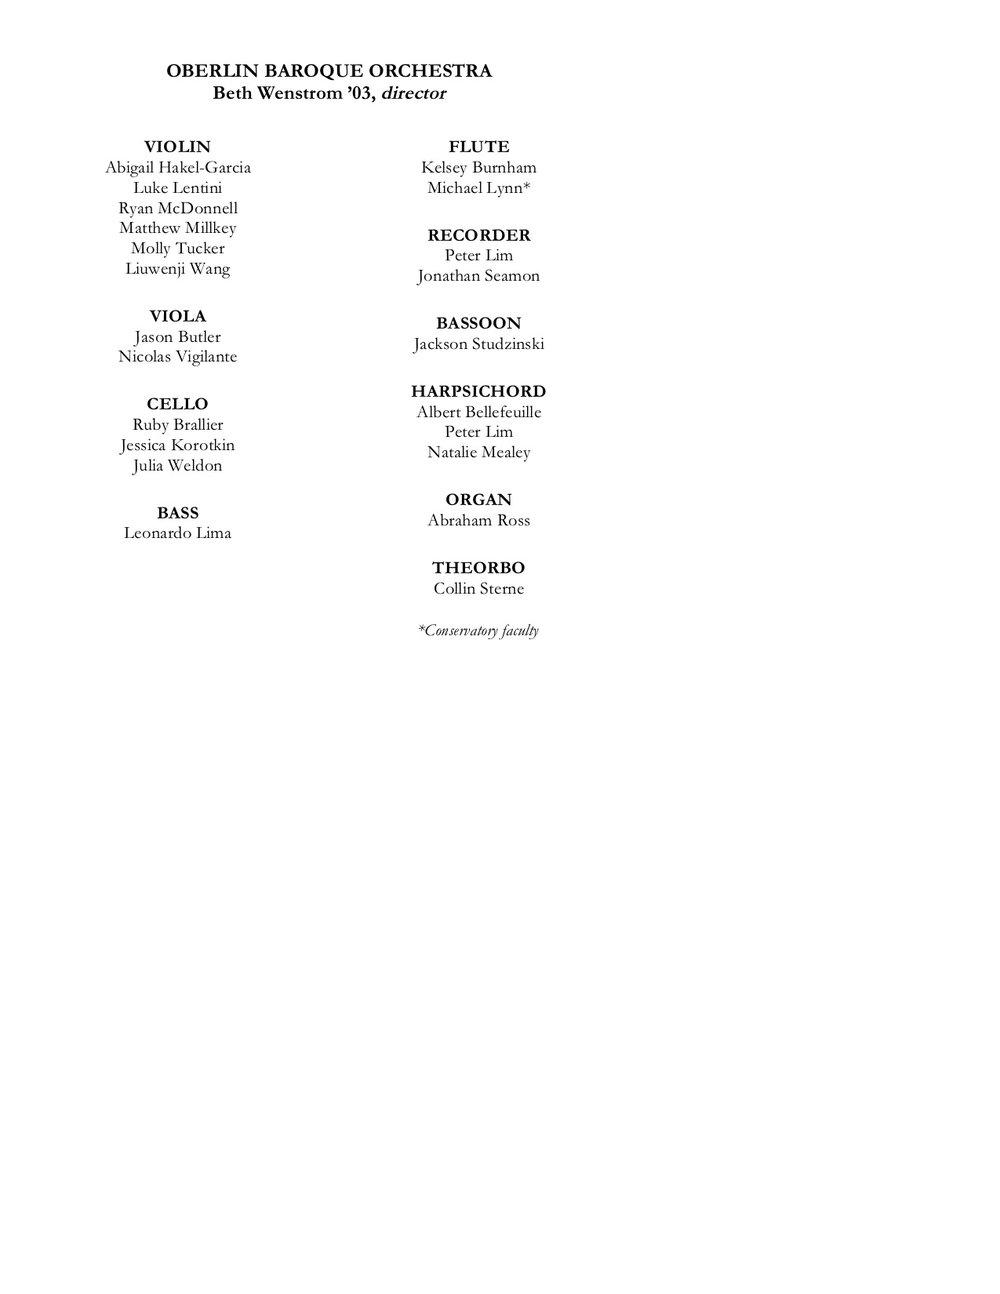 11-4 Baroque Orchestra2.jpg